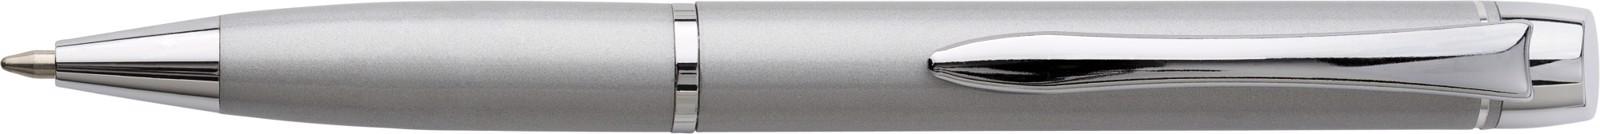 Metal ballpen - Silver